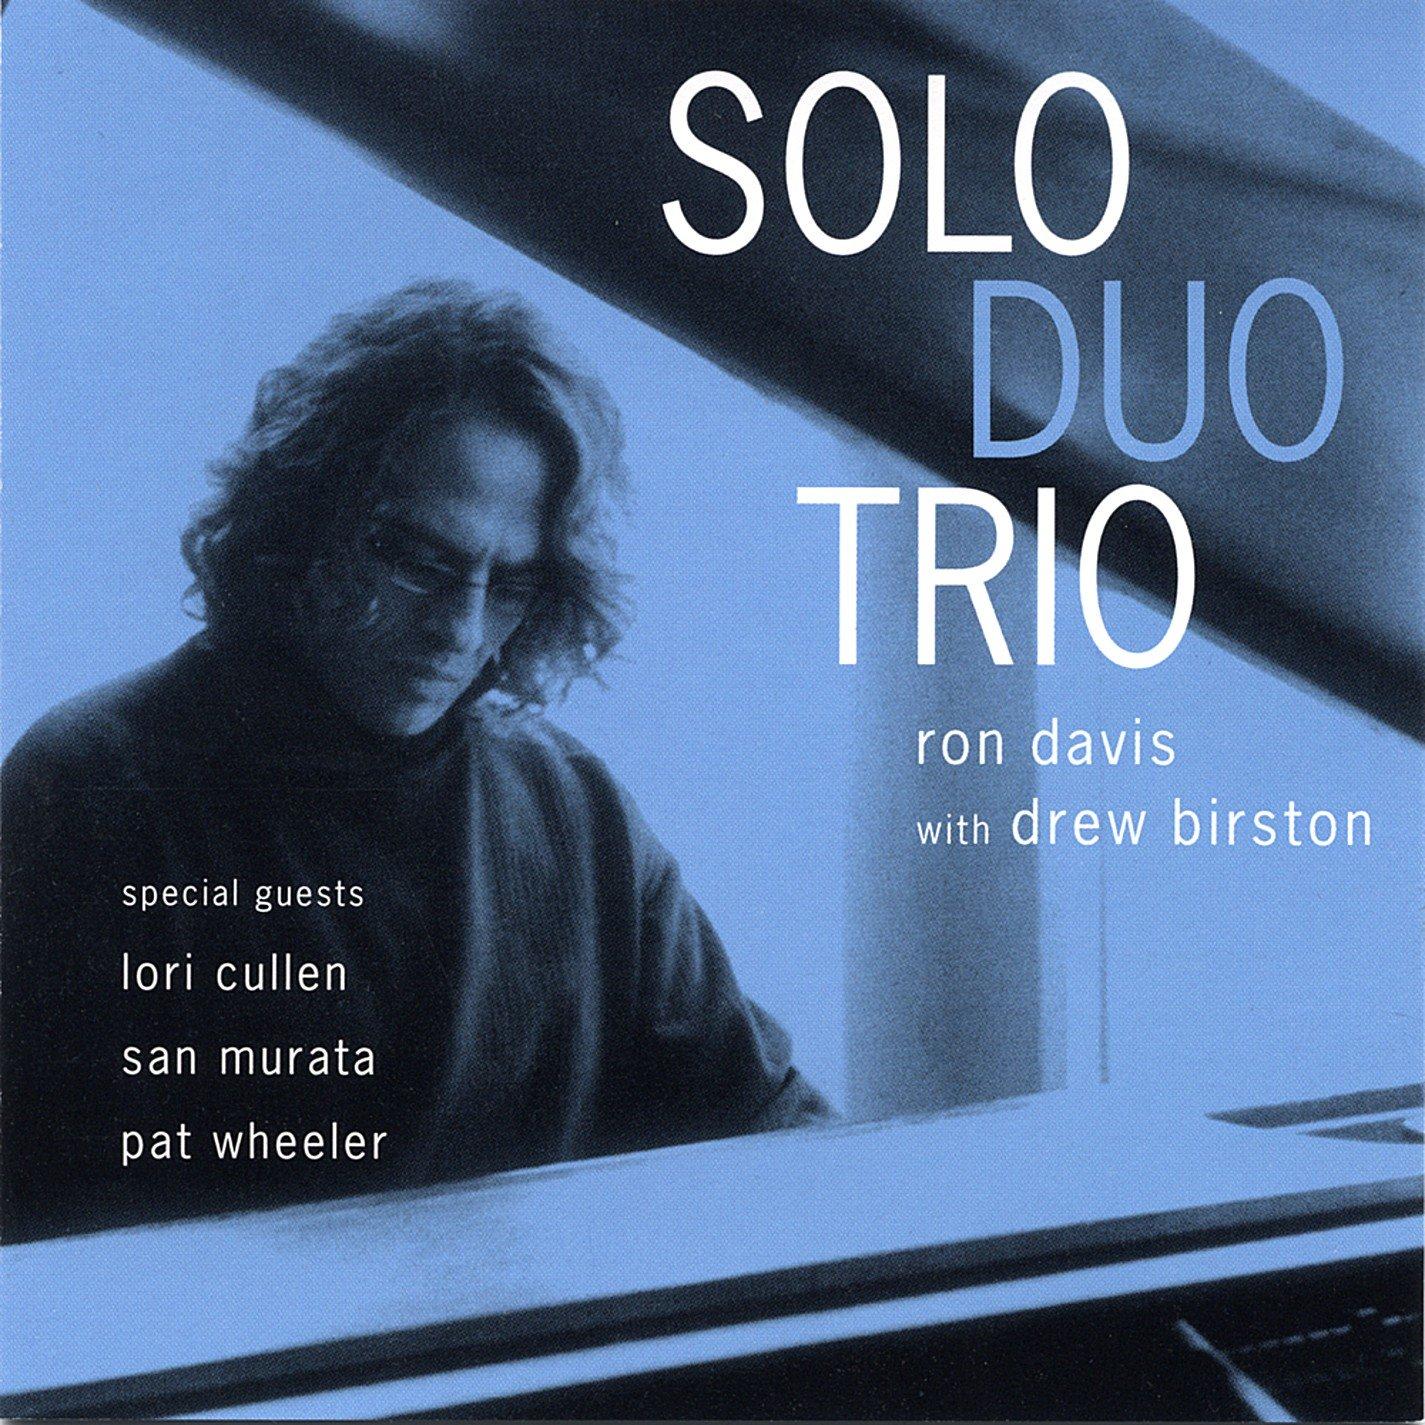 DAVIS,RON SOLO DUO TRIO: Ron Davis: Amazon.es: Música